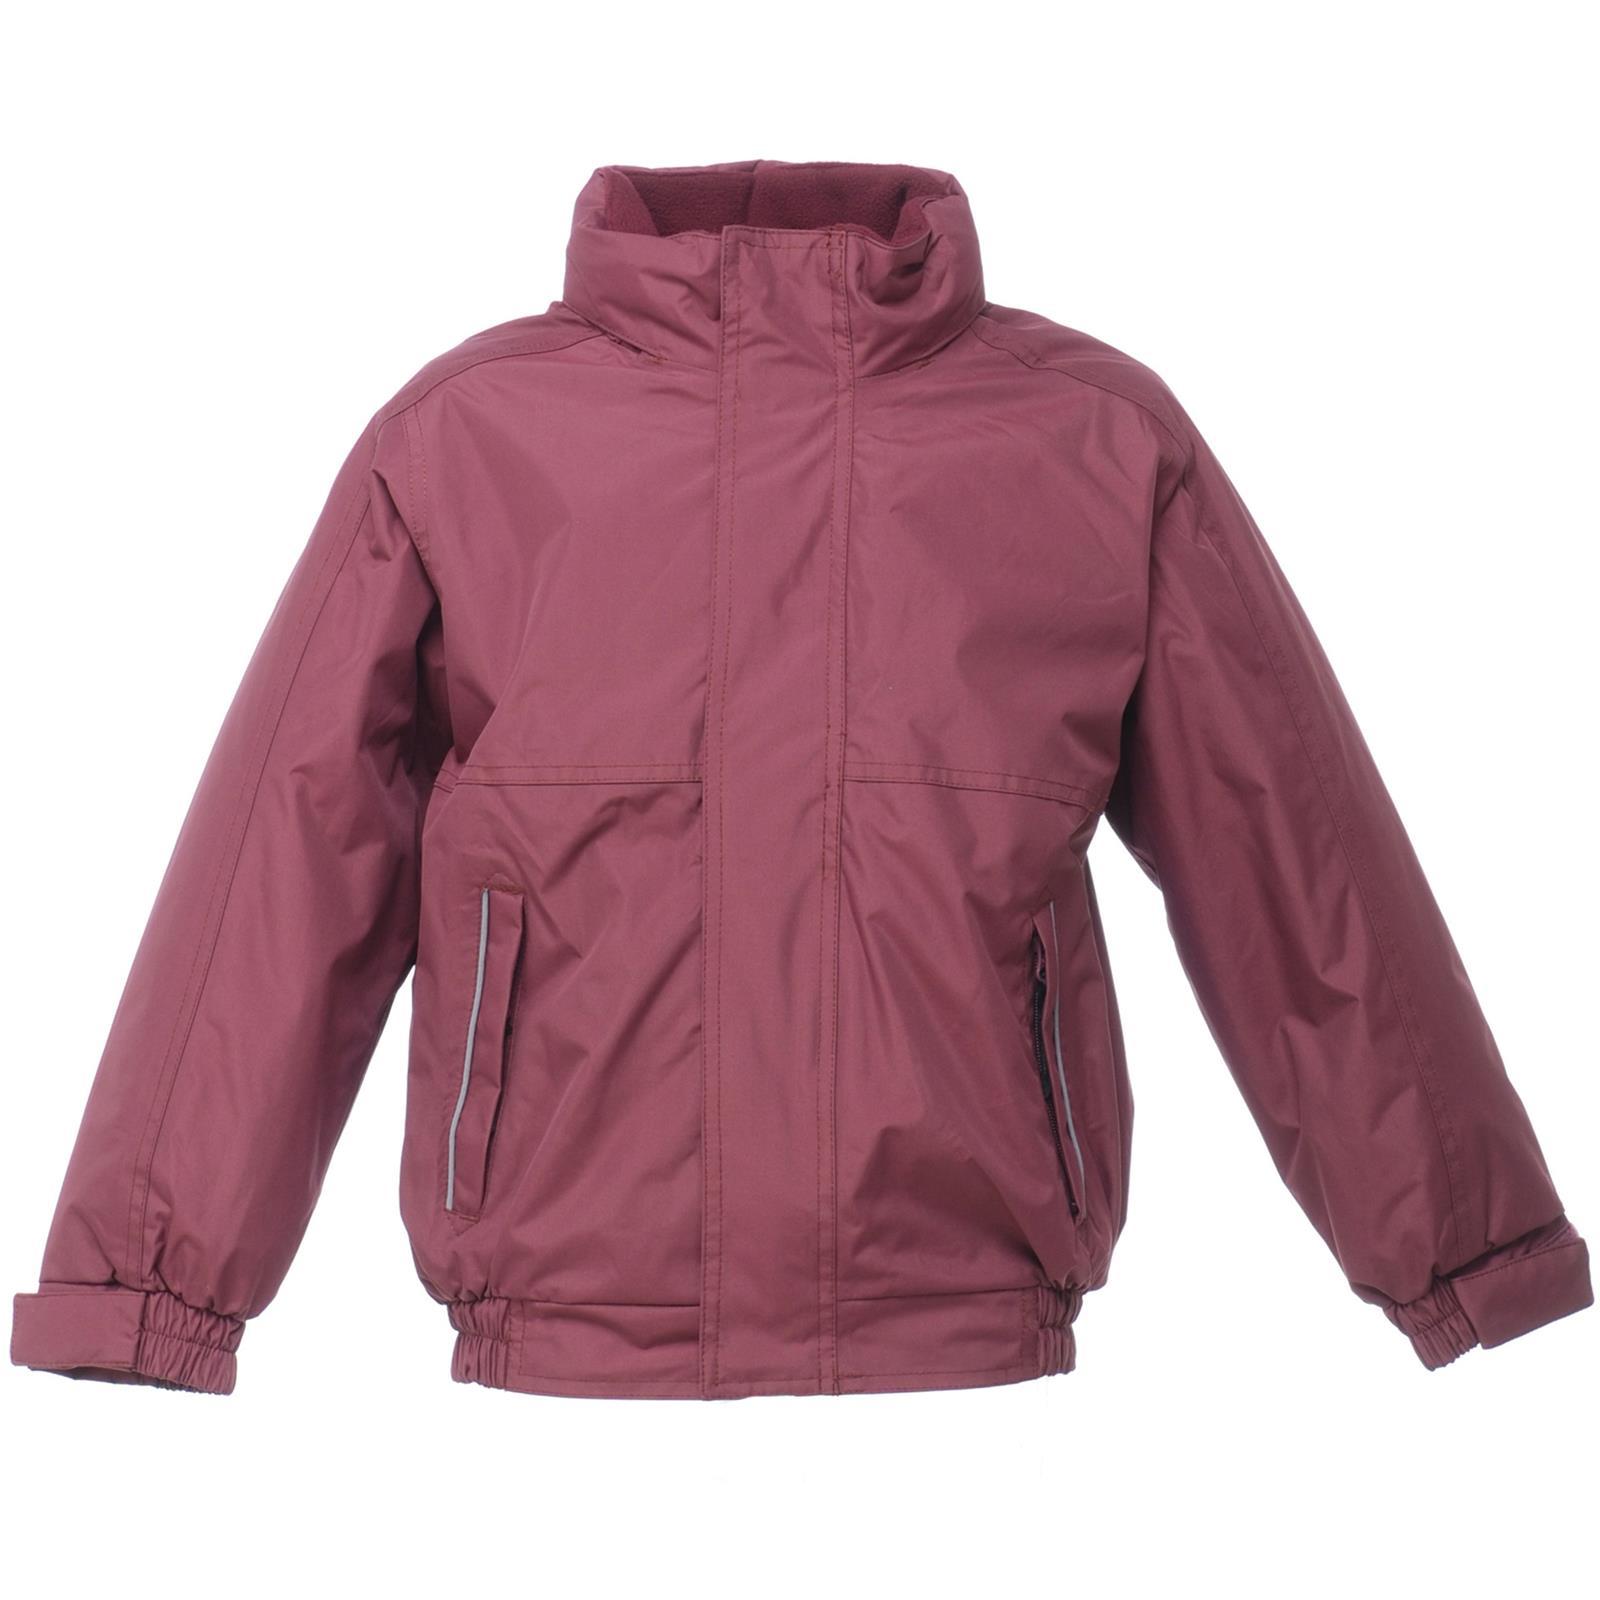 New REGATTA Childrens Kids School Dover Fleece Lined Jacket 6 Colours 8 Sizes